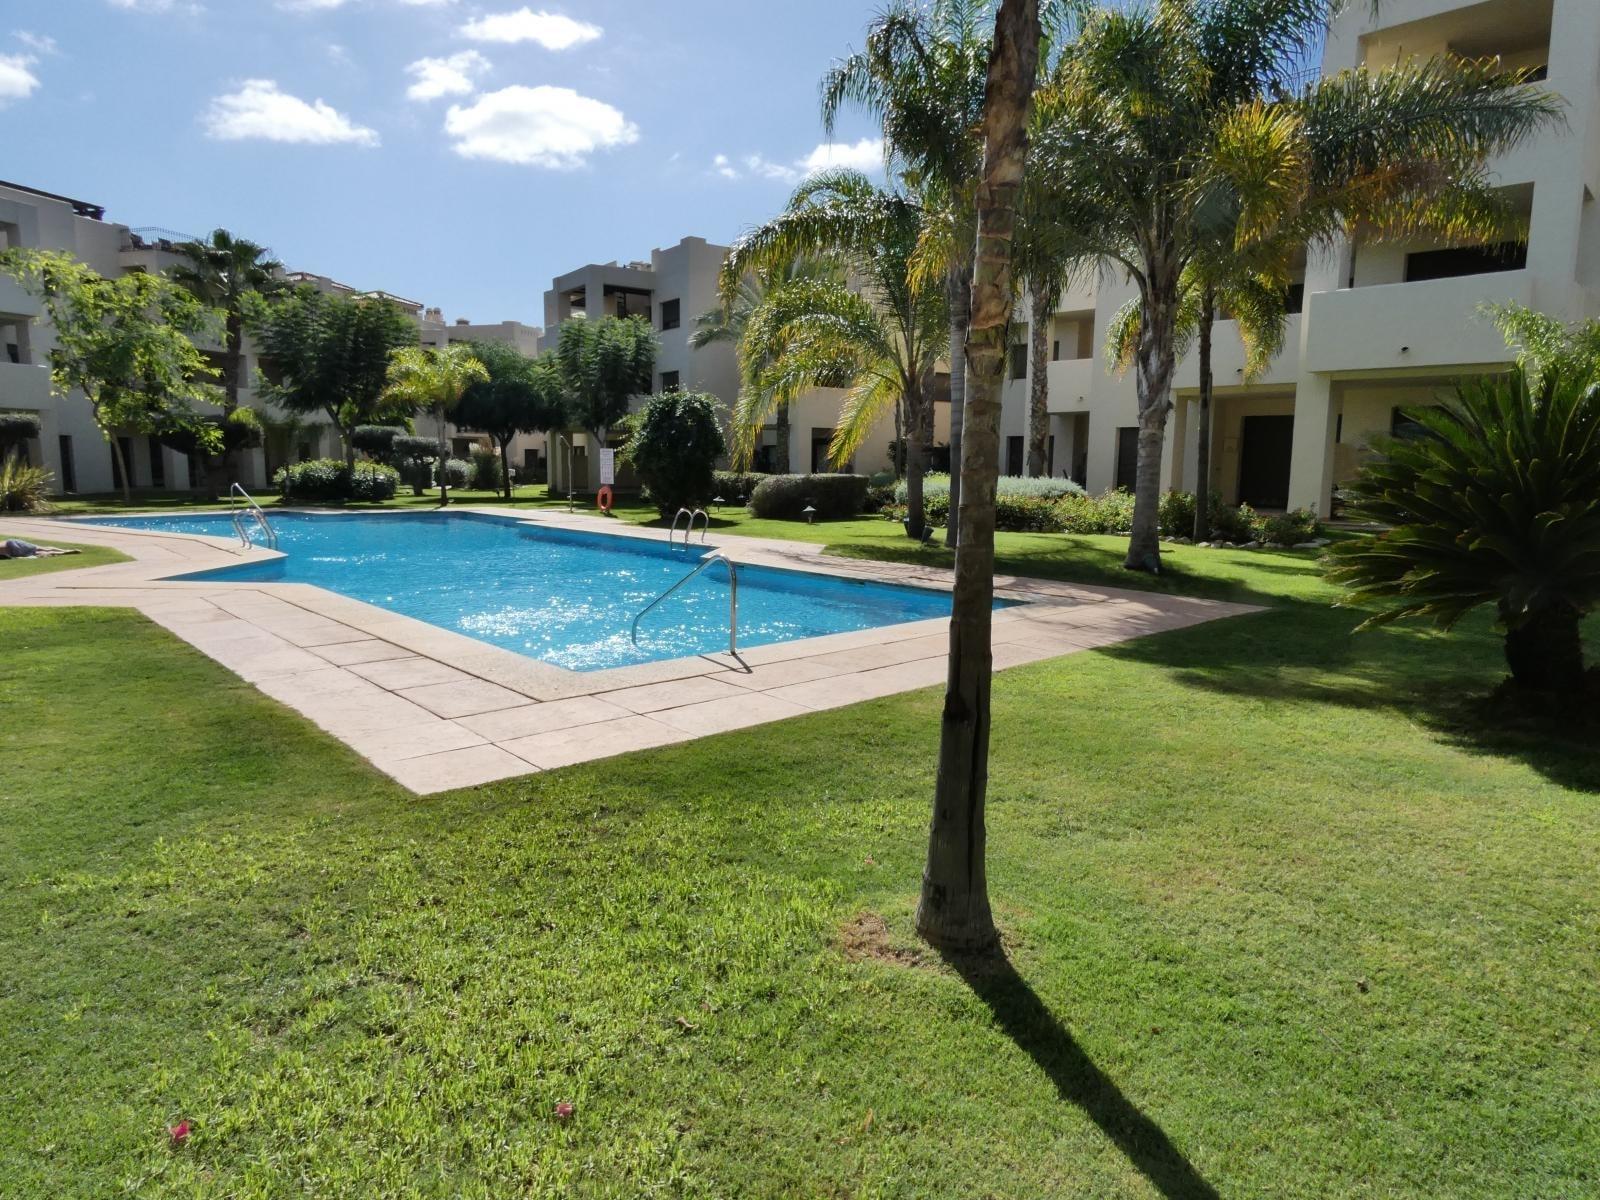 Apartment in Roda Golf and Beach Resort (Murcia)